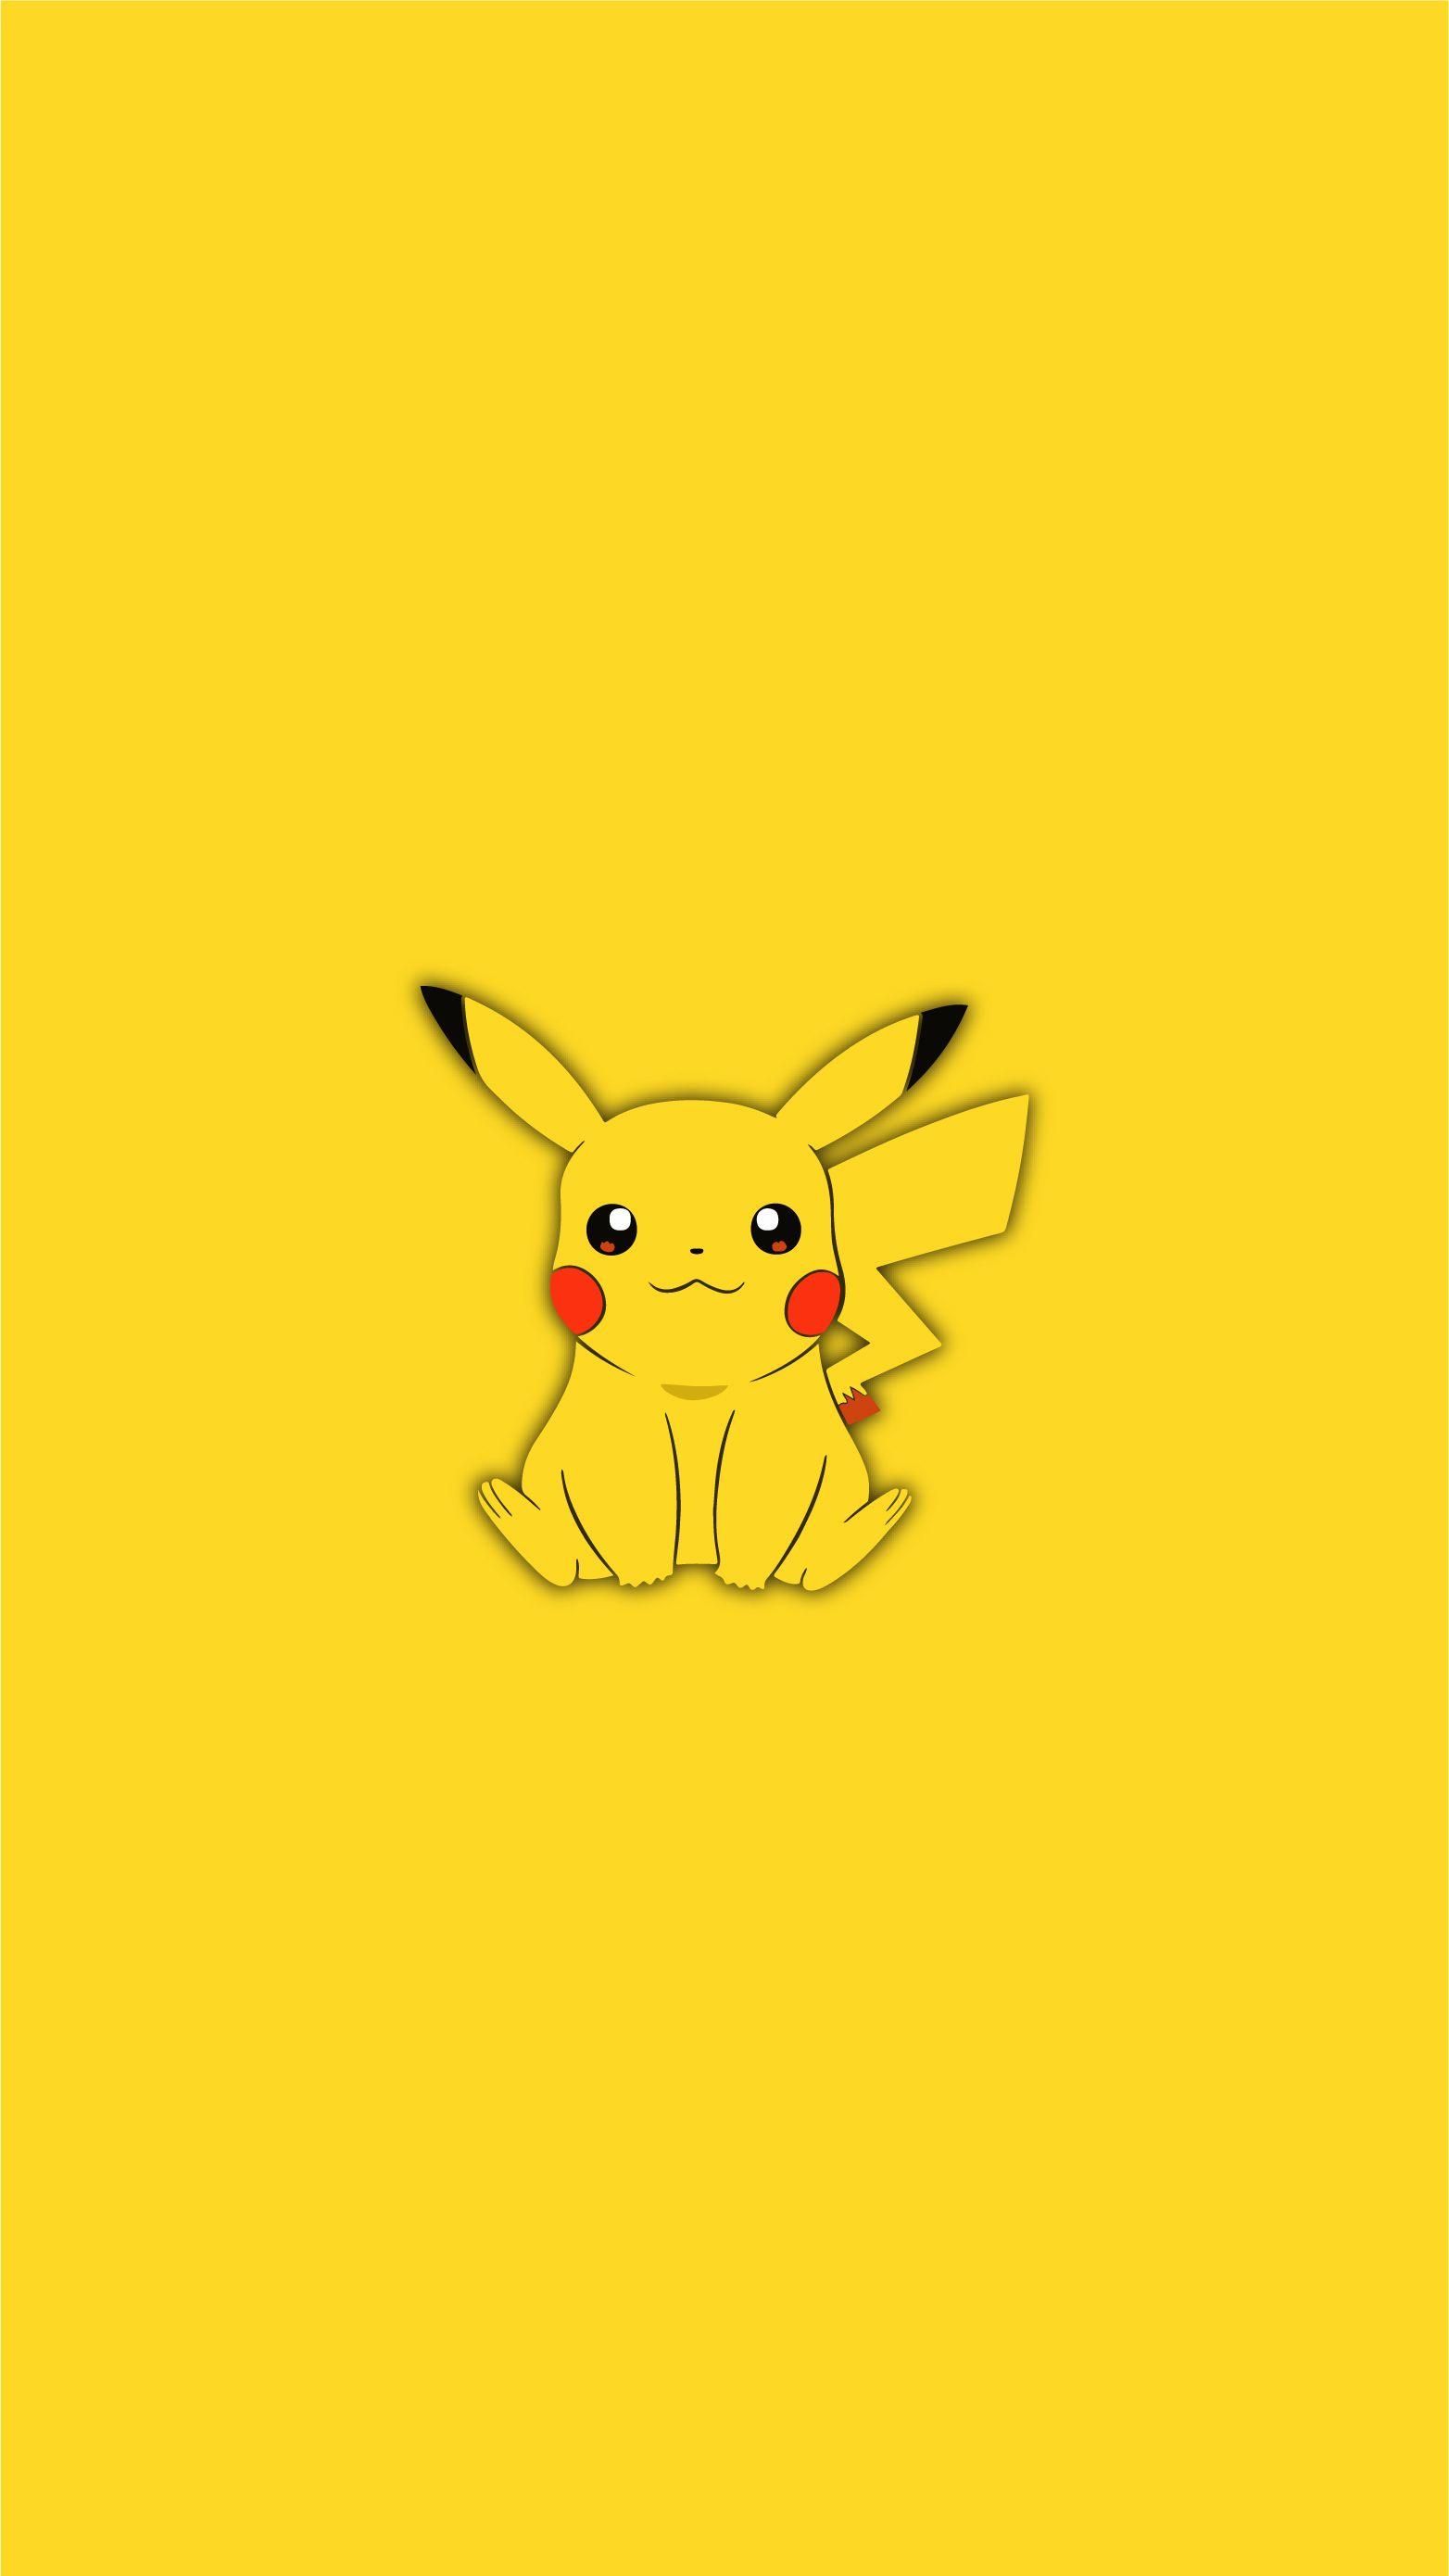 Minimal Pikachu Pikachu wallpaper, Pikachu, Pikachu